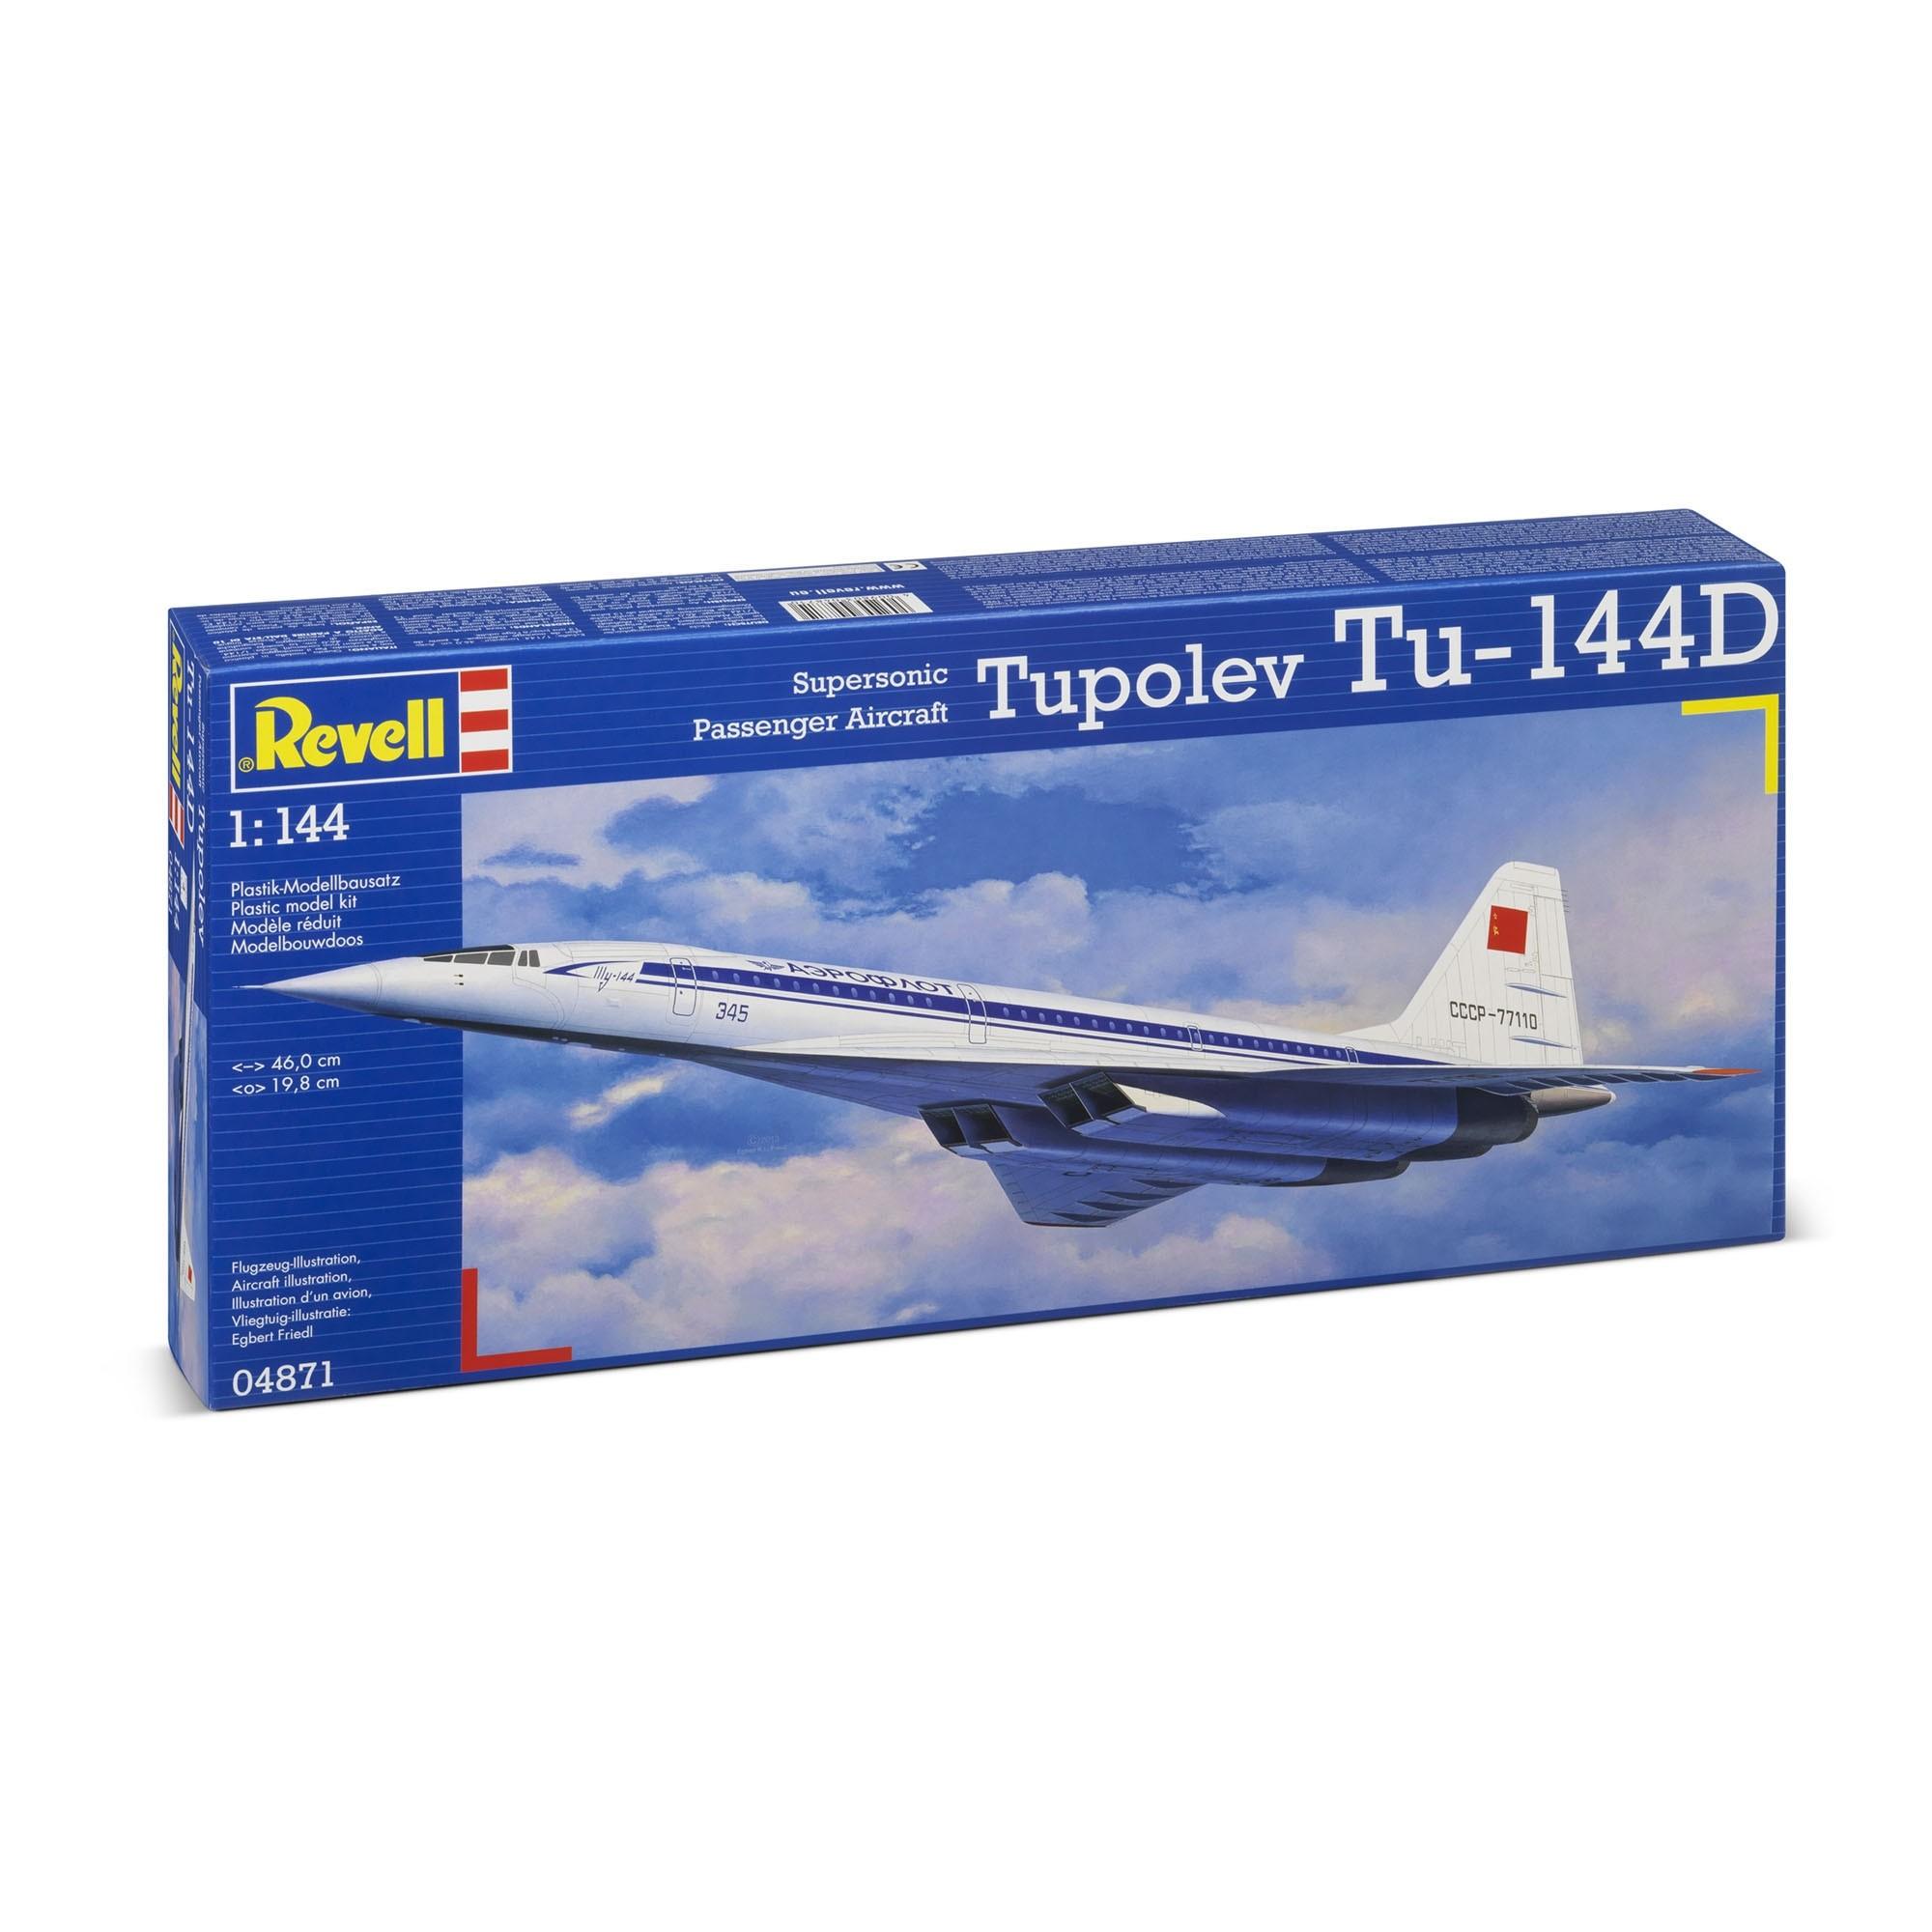 Revell 04871 Modellbausatz - Tupolev TU-144D 1:144